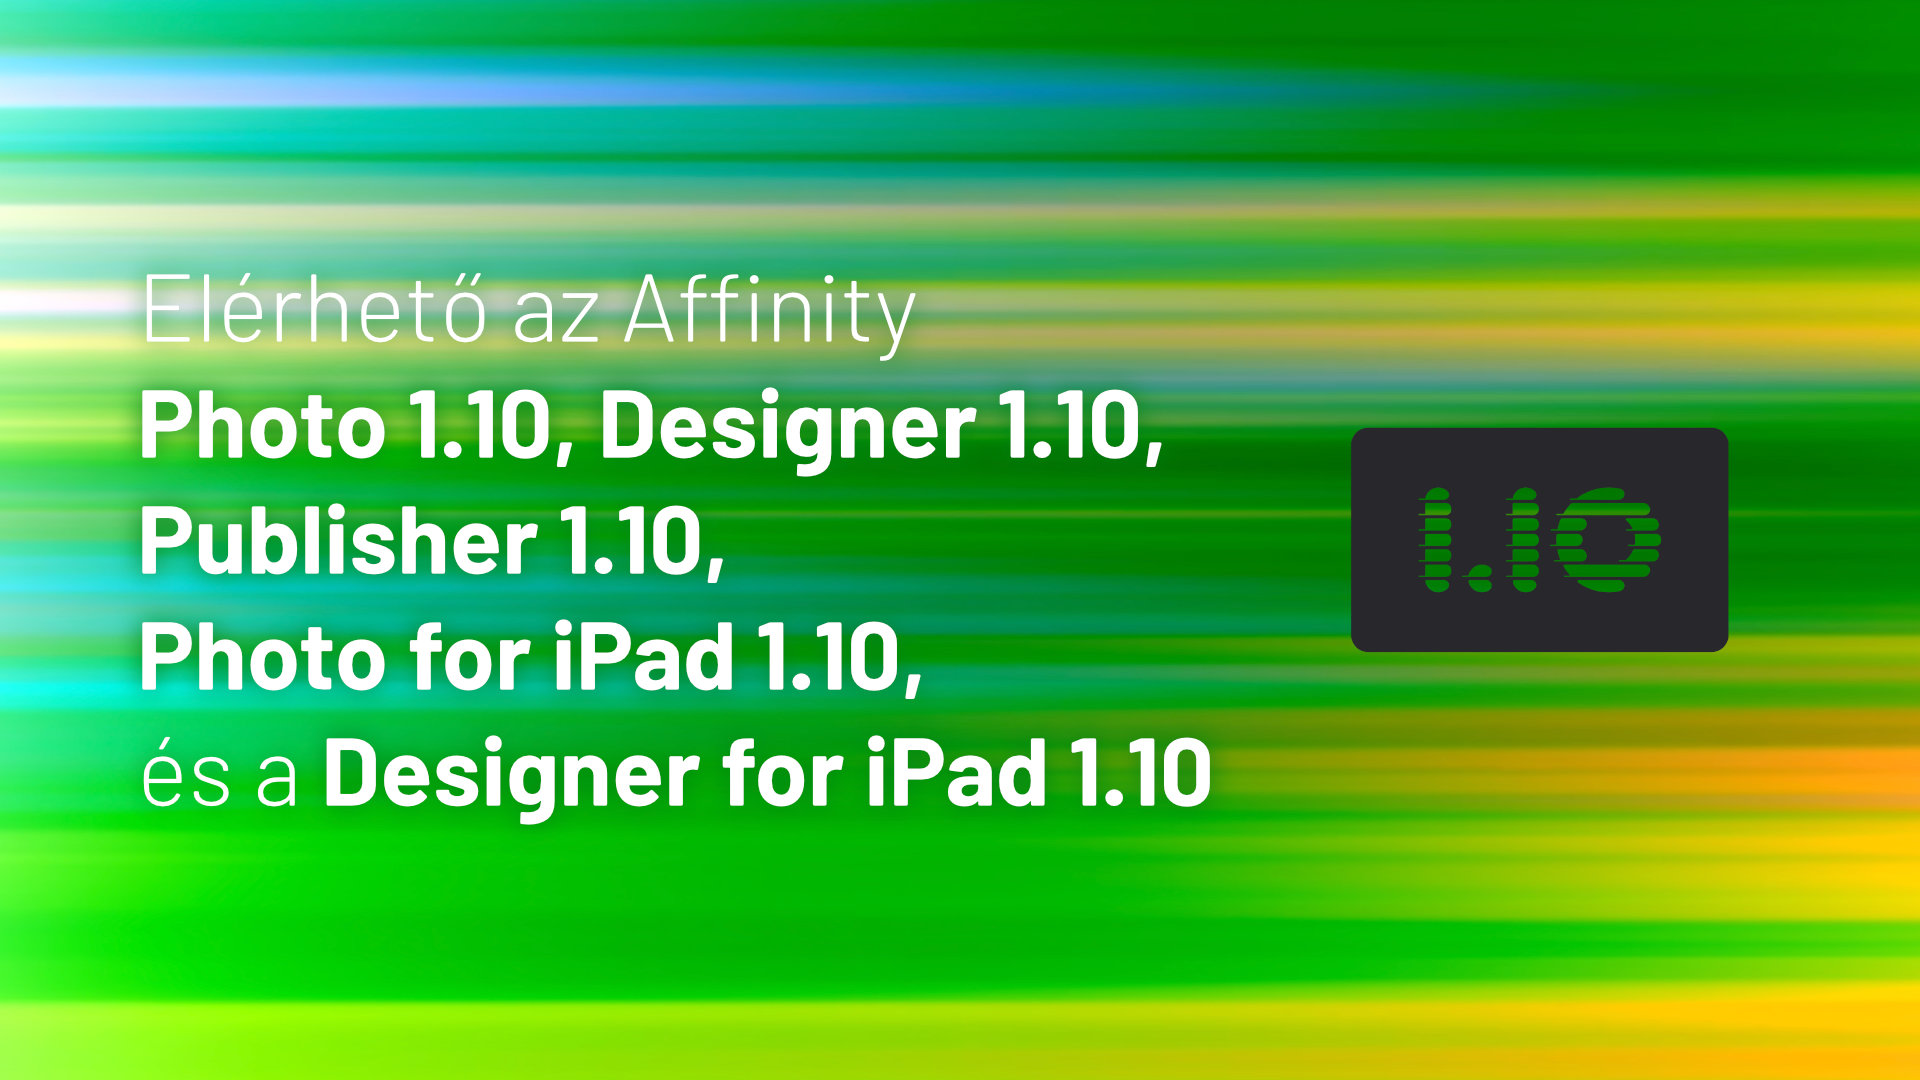 az Affinity Photo 1.10, Designer 1.10 és Publisher 1.10